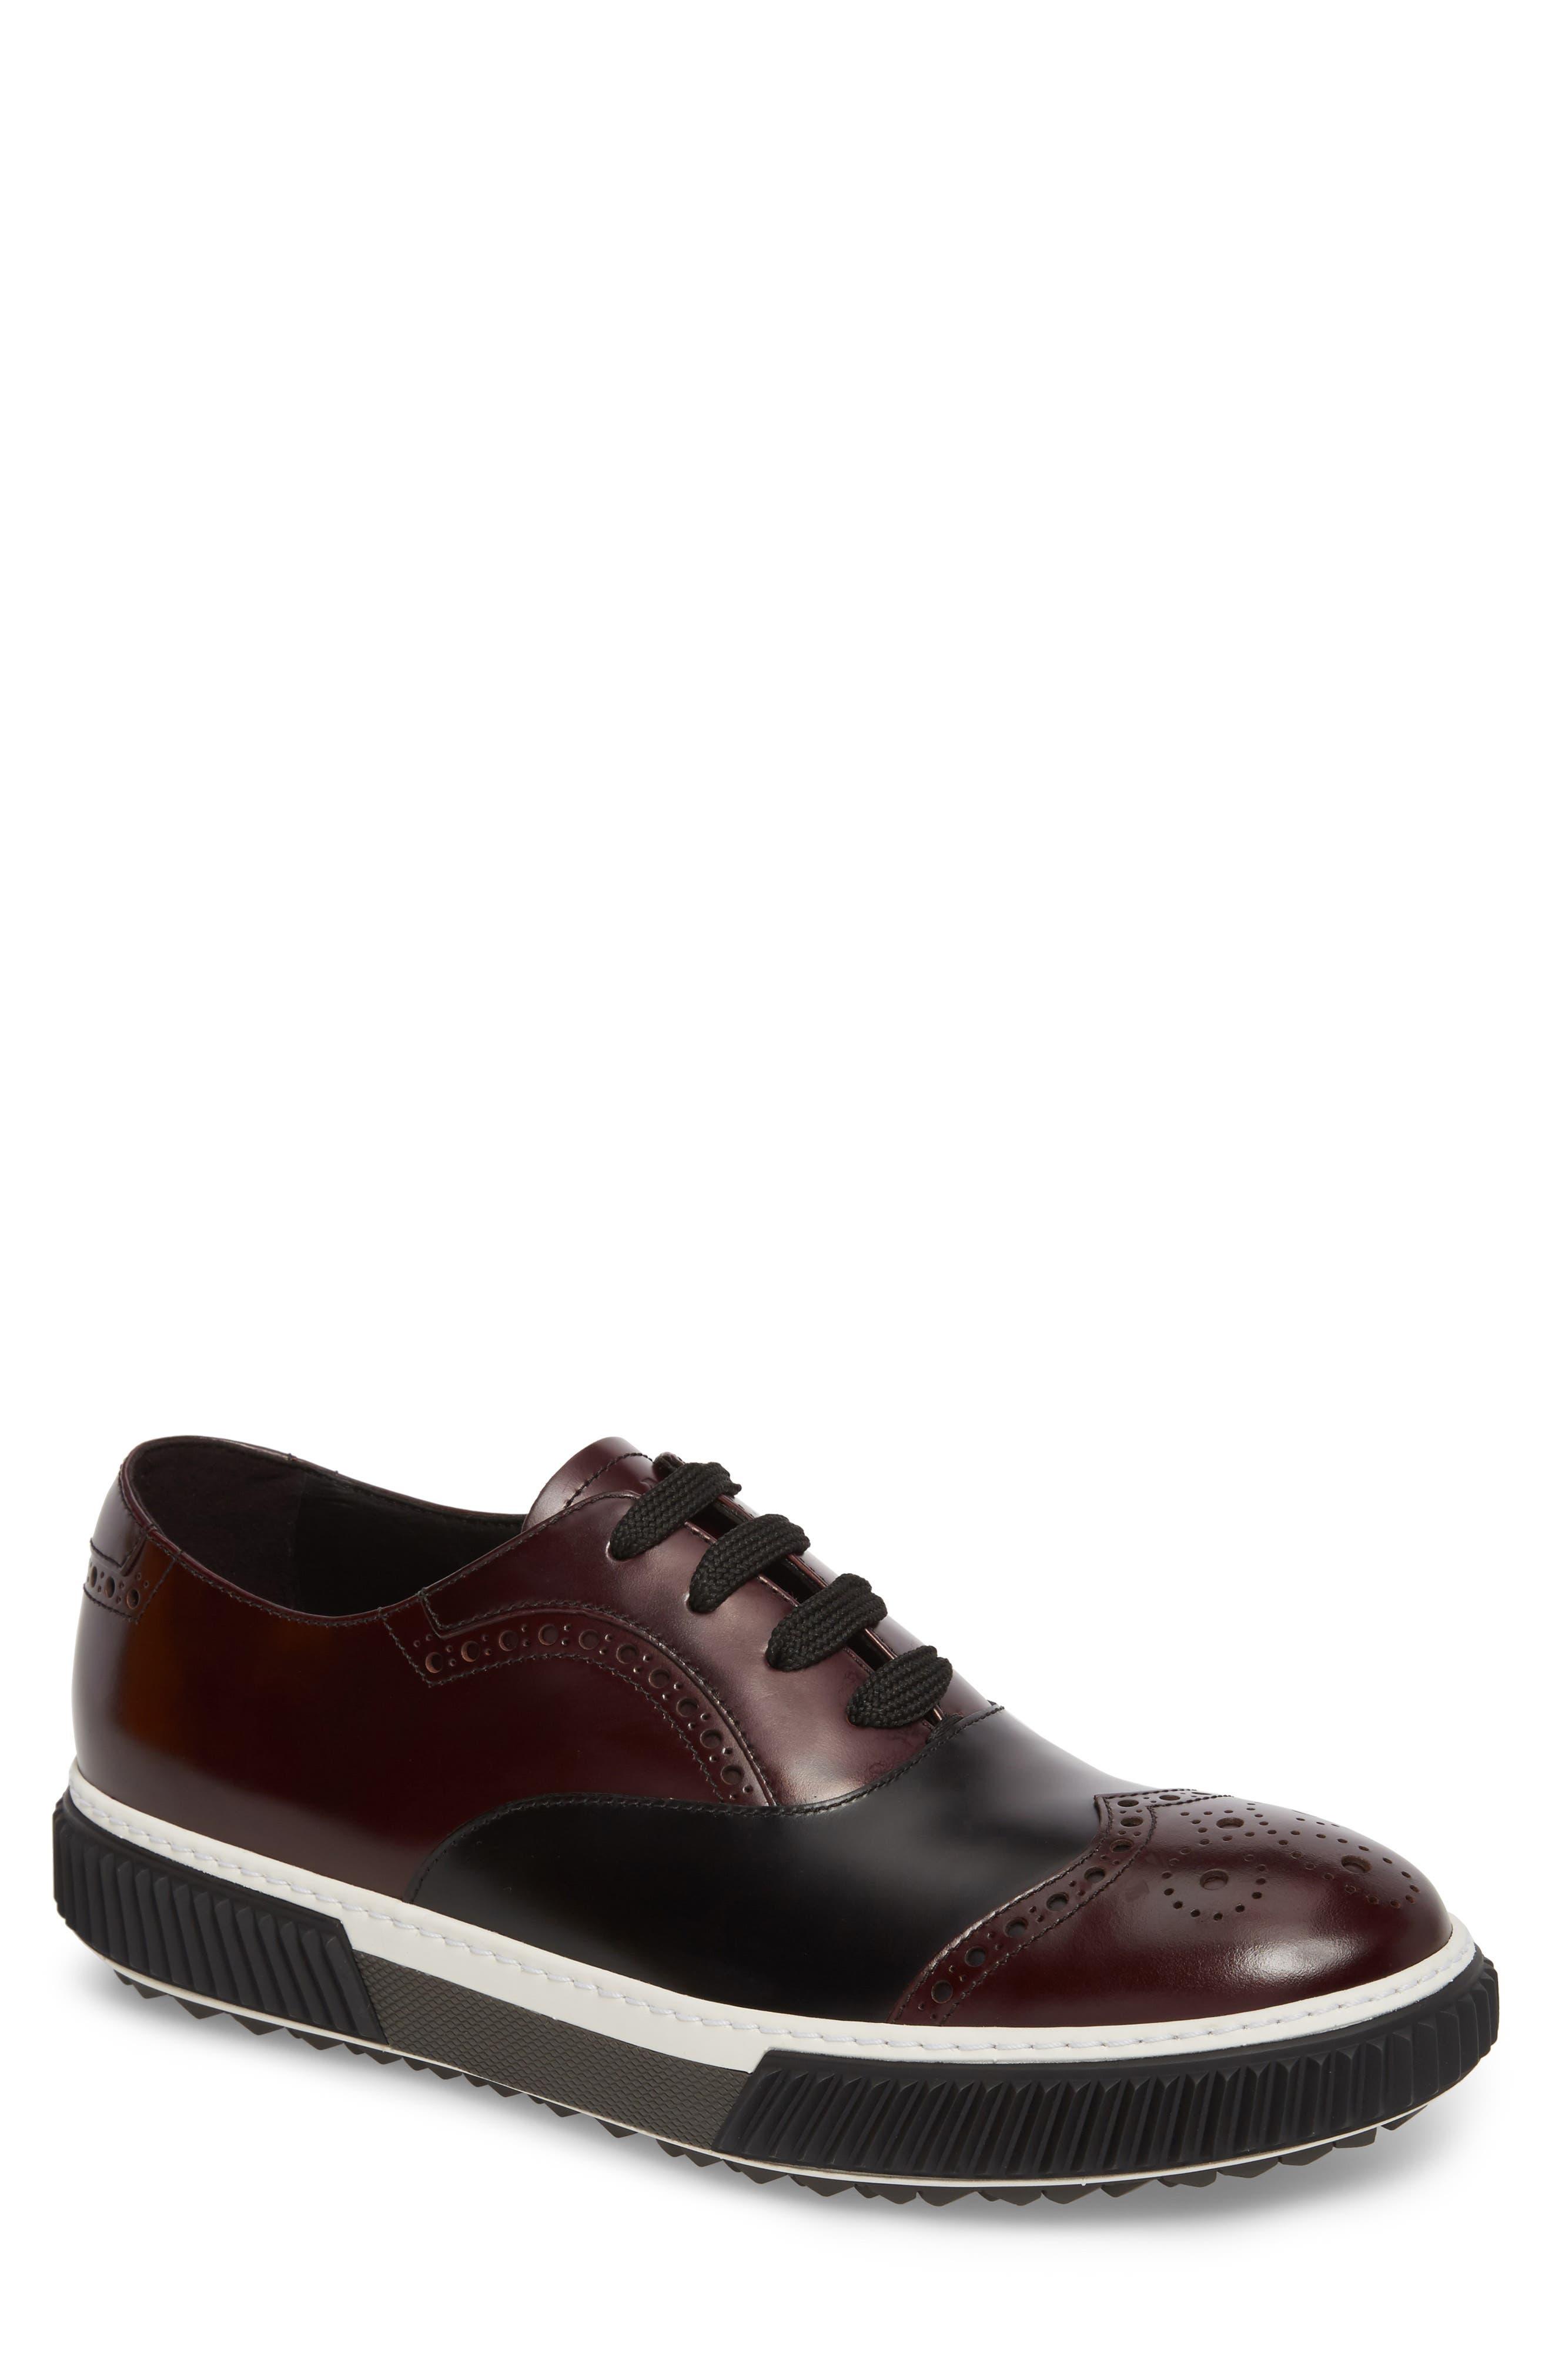 Linea Rossa Wingtip Sneaker,                             Main thumbnail 1, color,                             Cordovan Nero